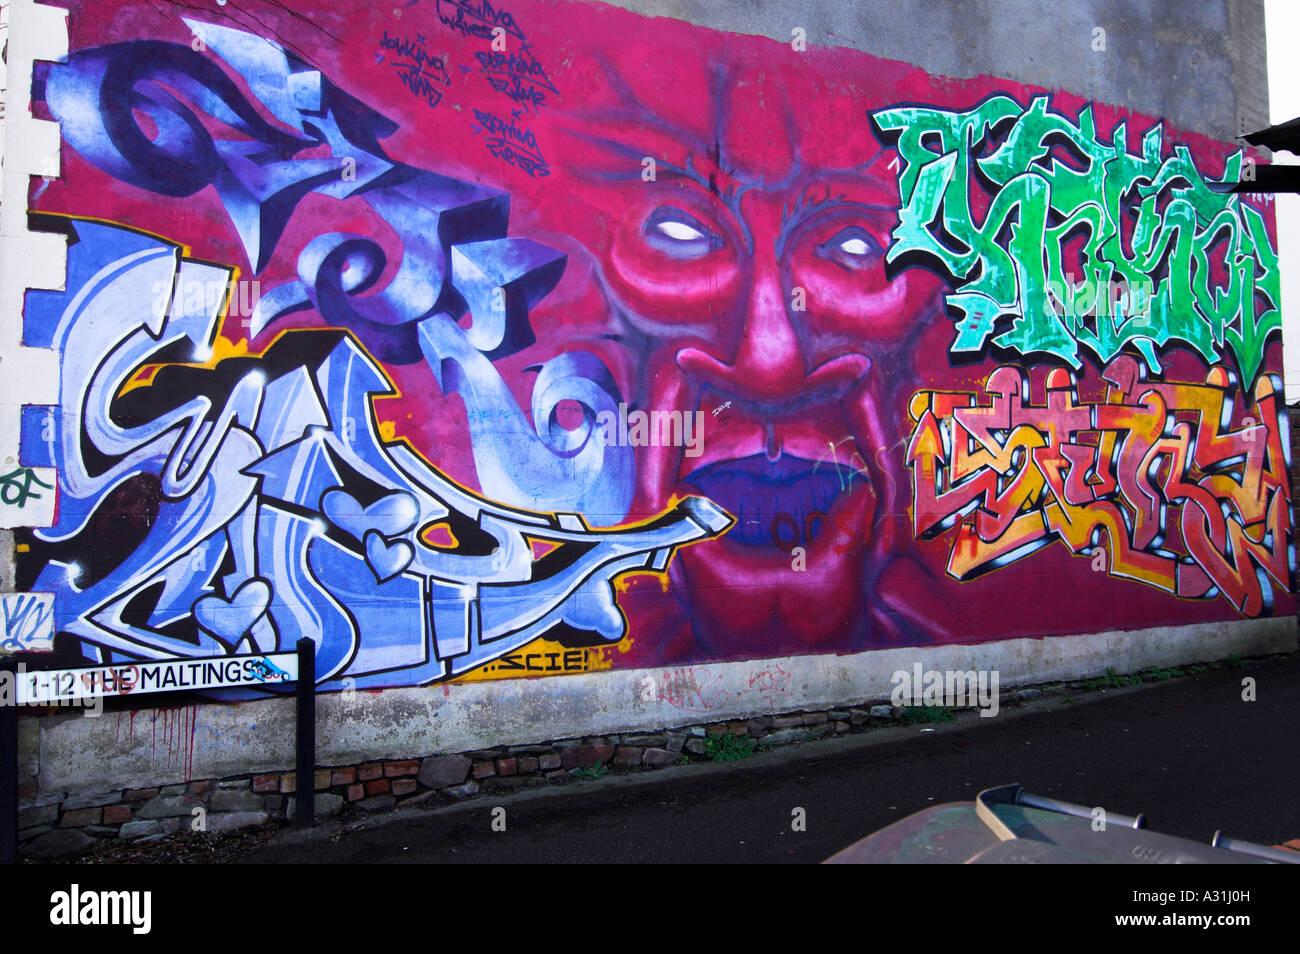 Graffiti wall art montpelier bristol uk